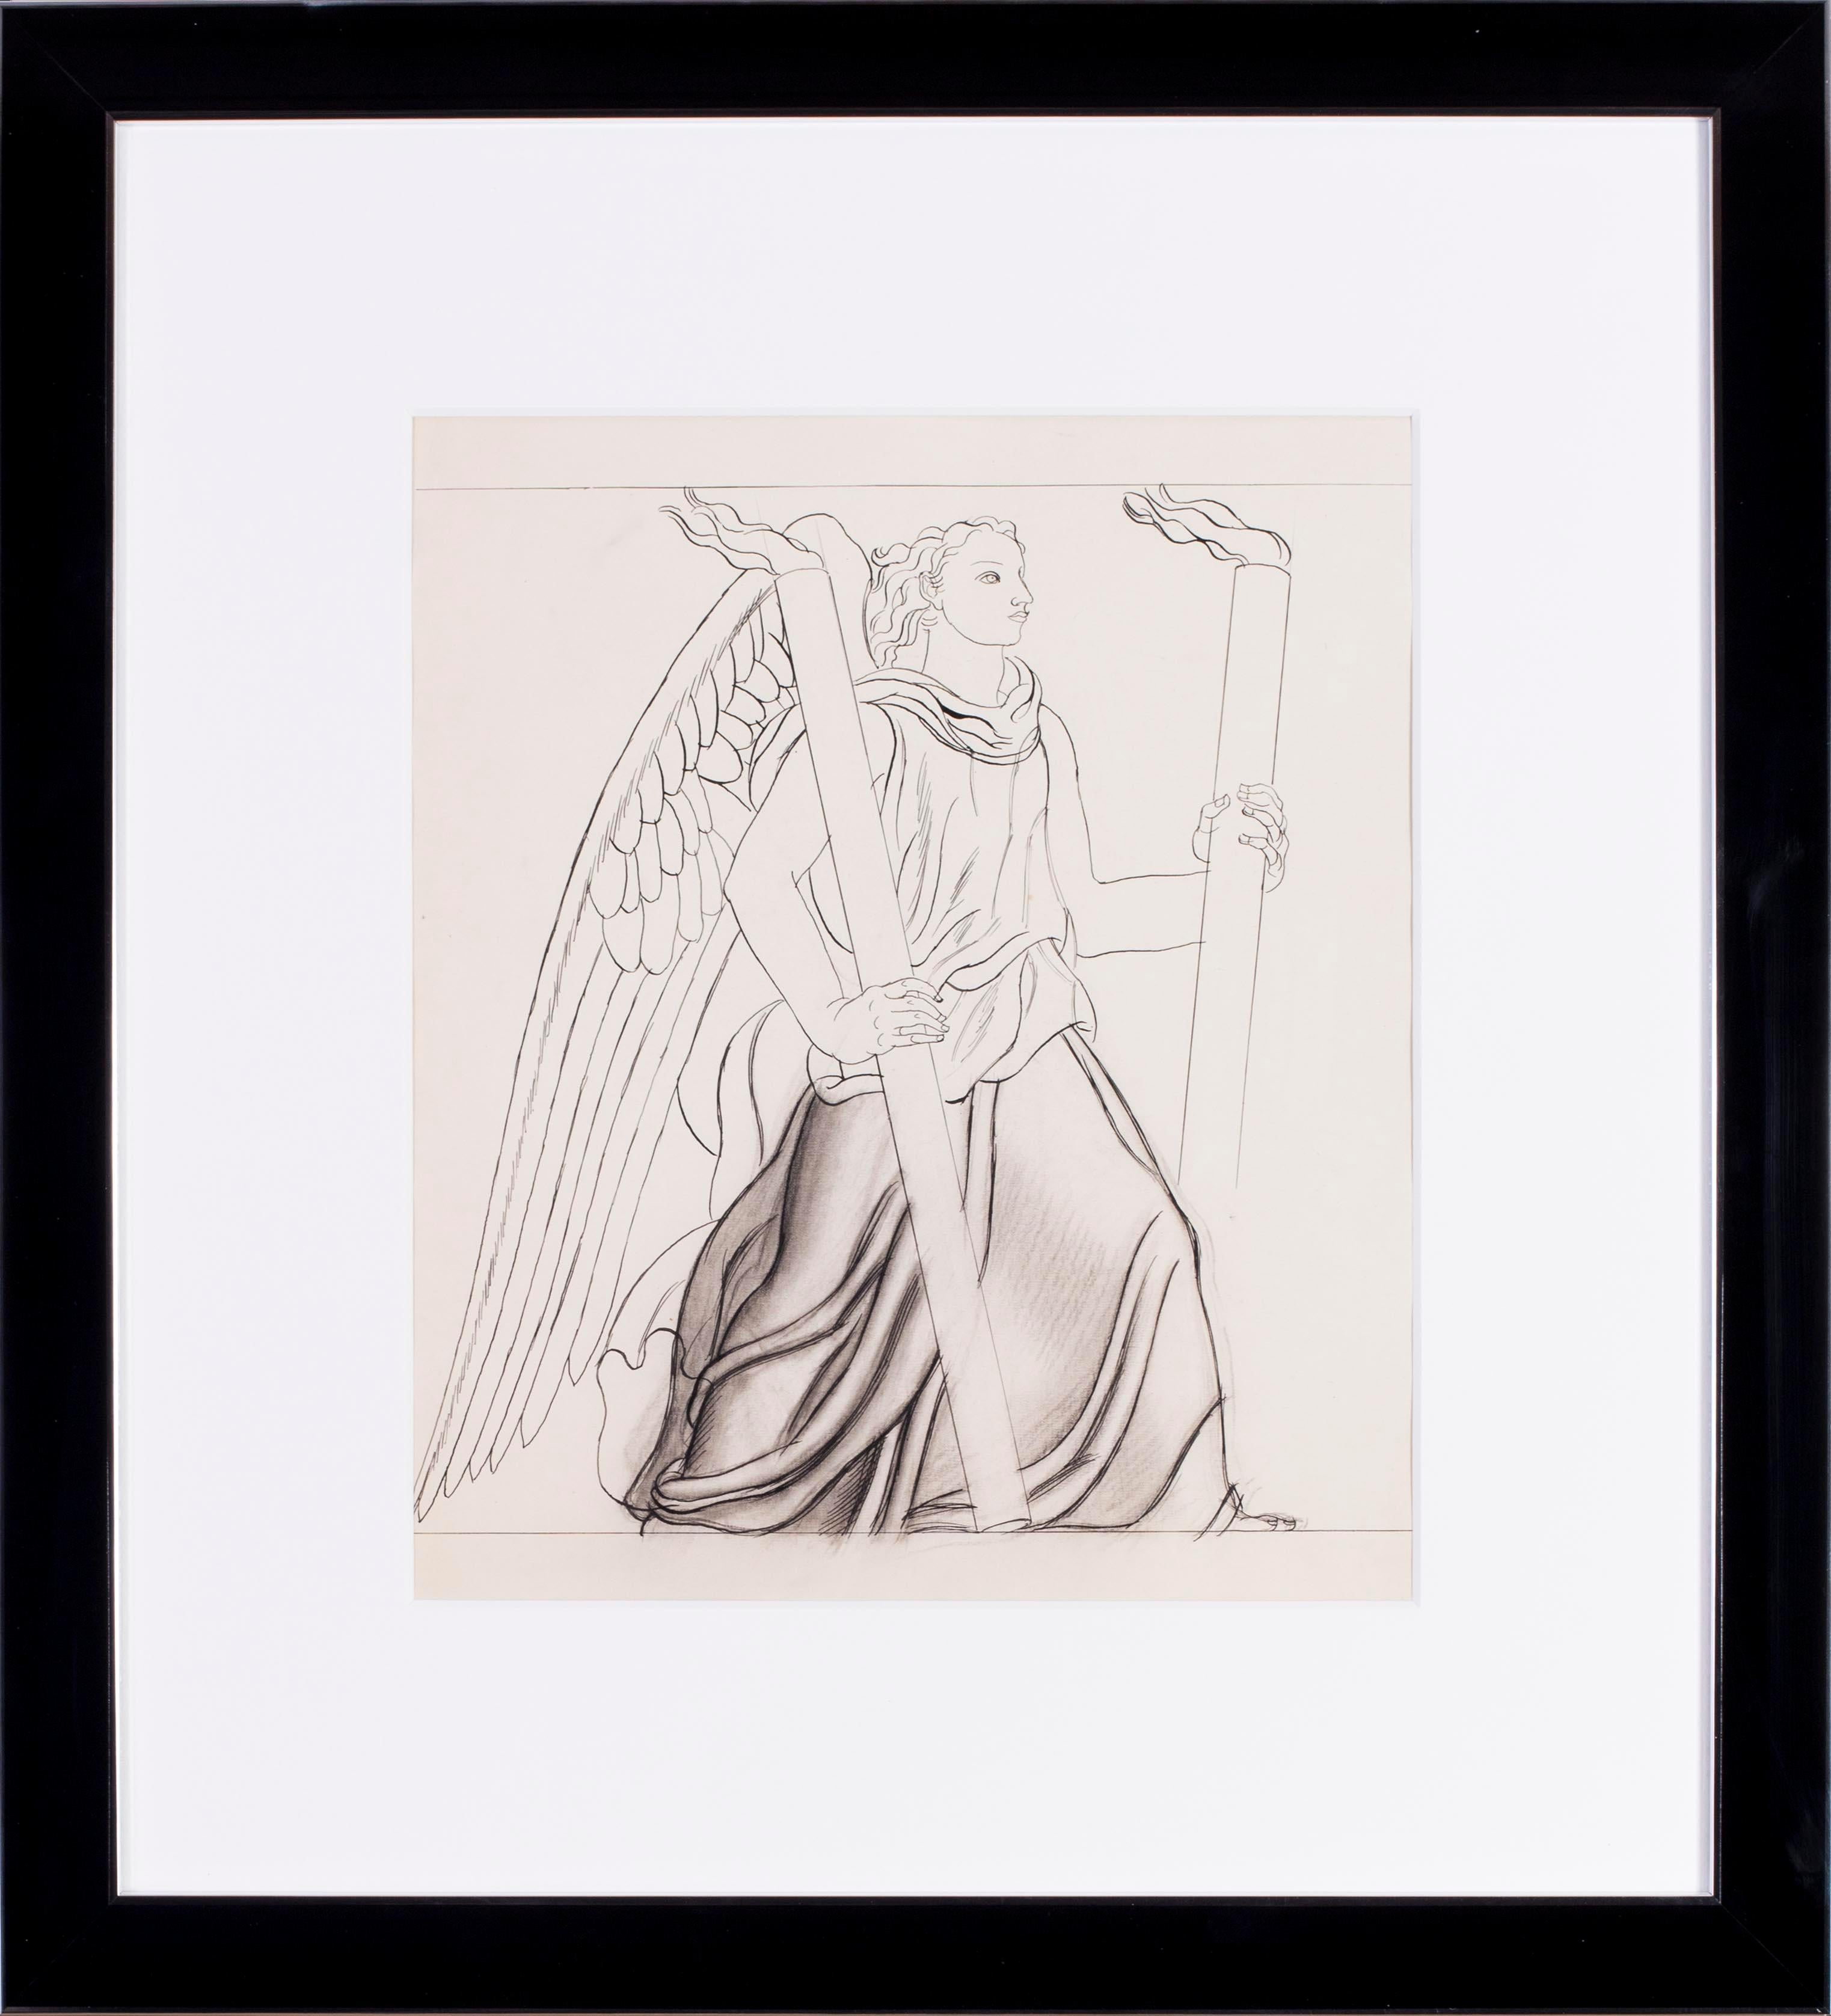 Jean Dupas art deco drawing, 'The Angel of light'